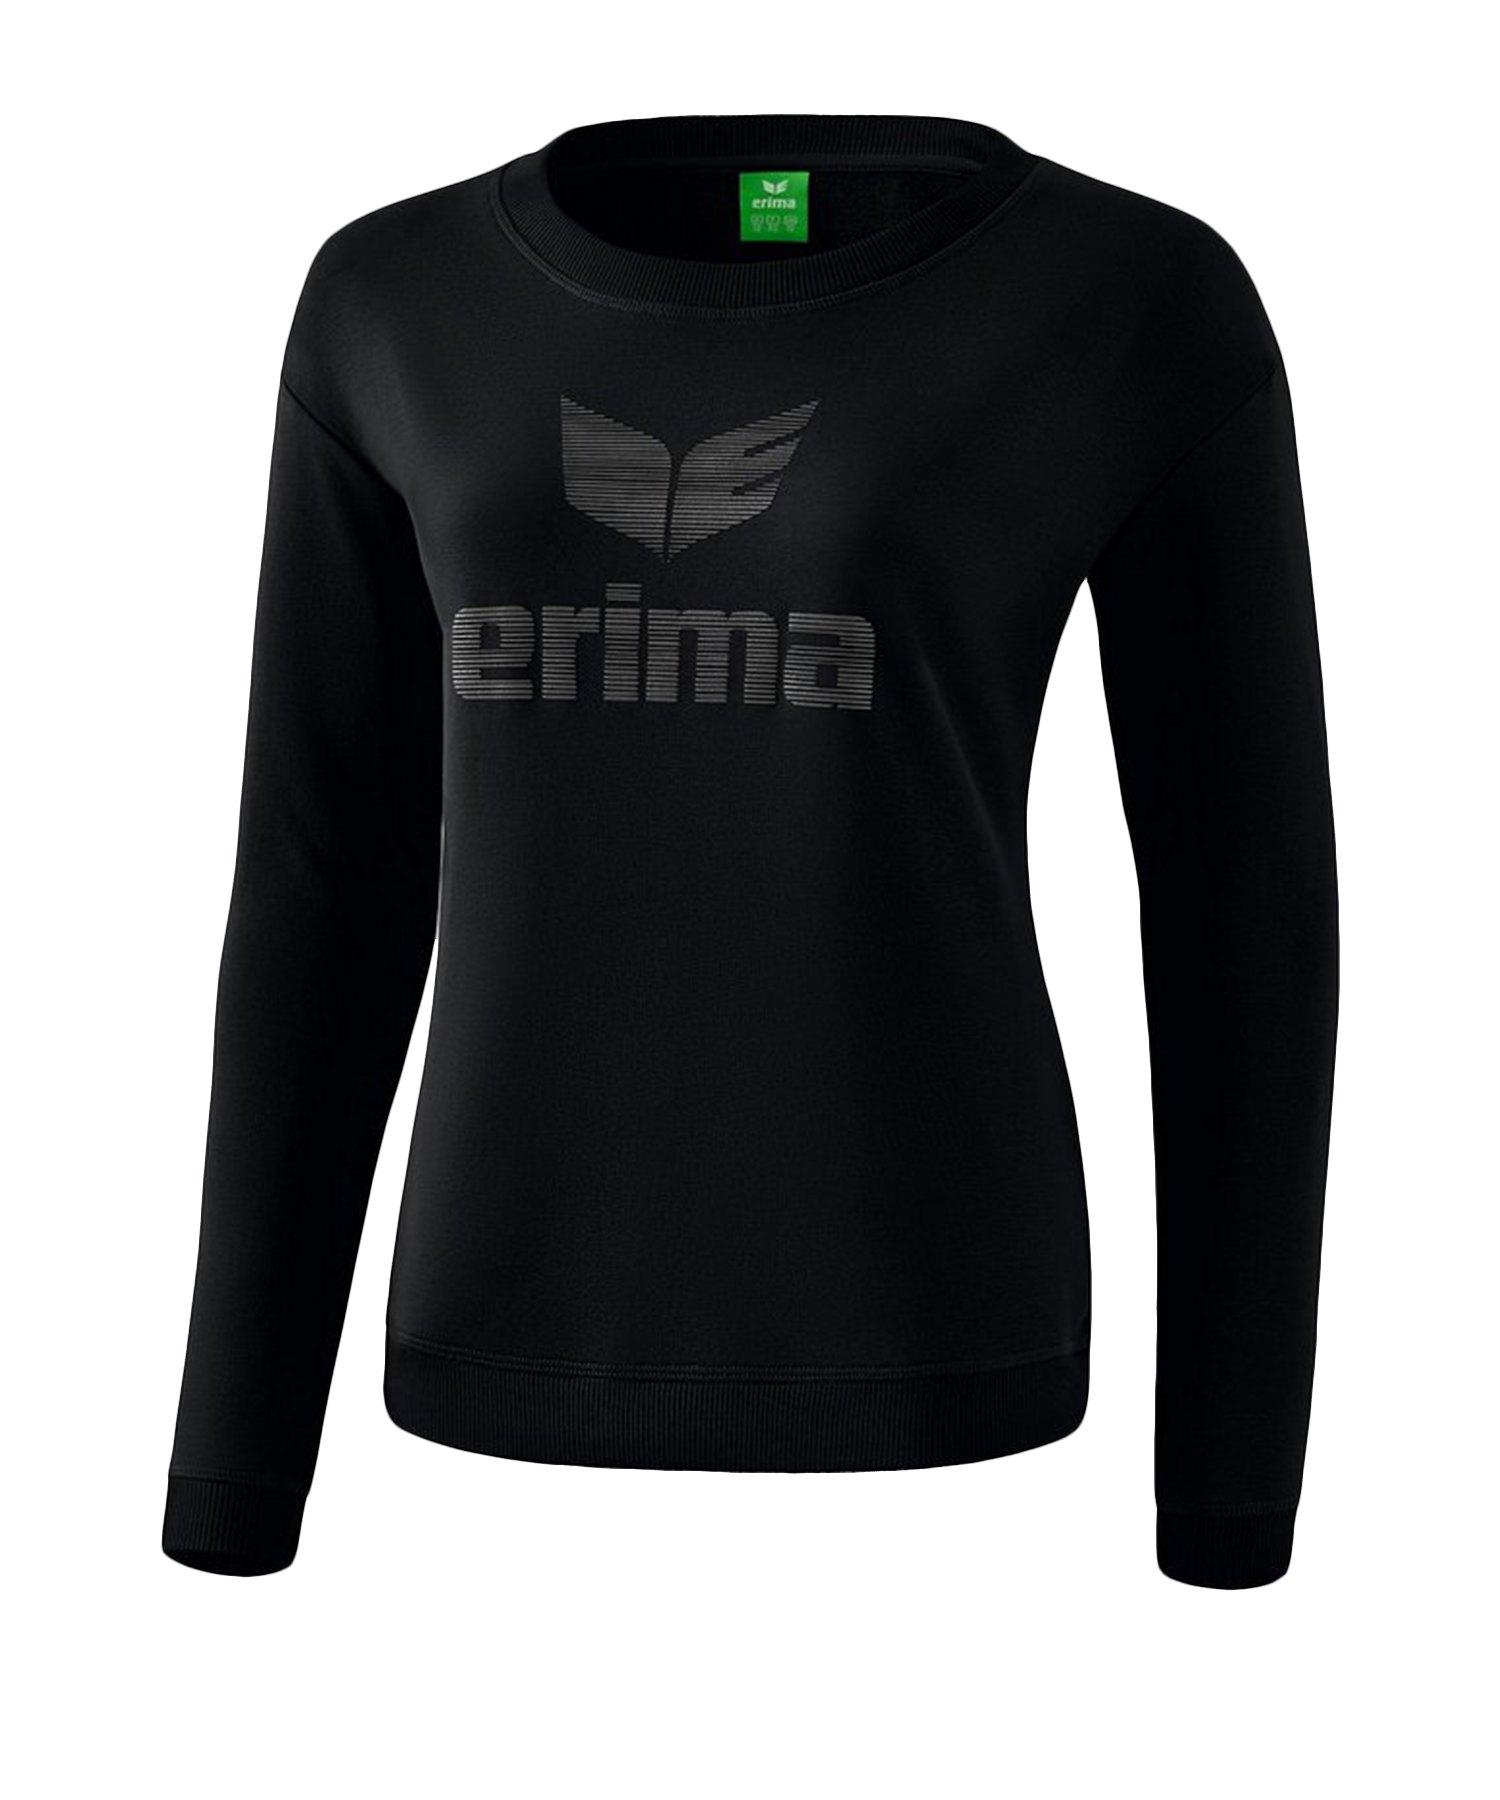 Erima Essential Sweatshirt Damen Schwarz Grau - Schwarz